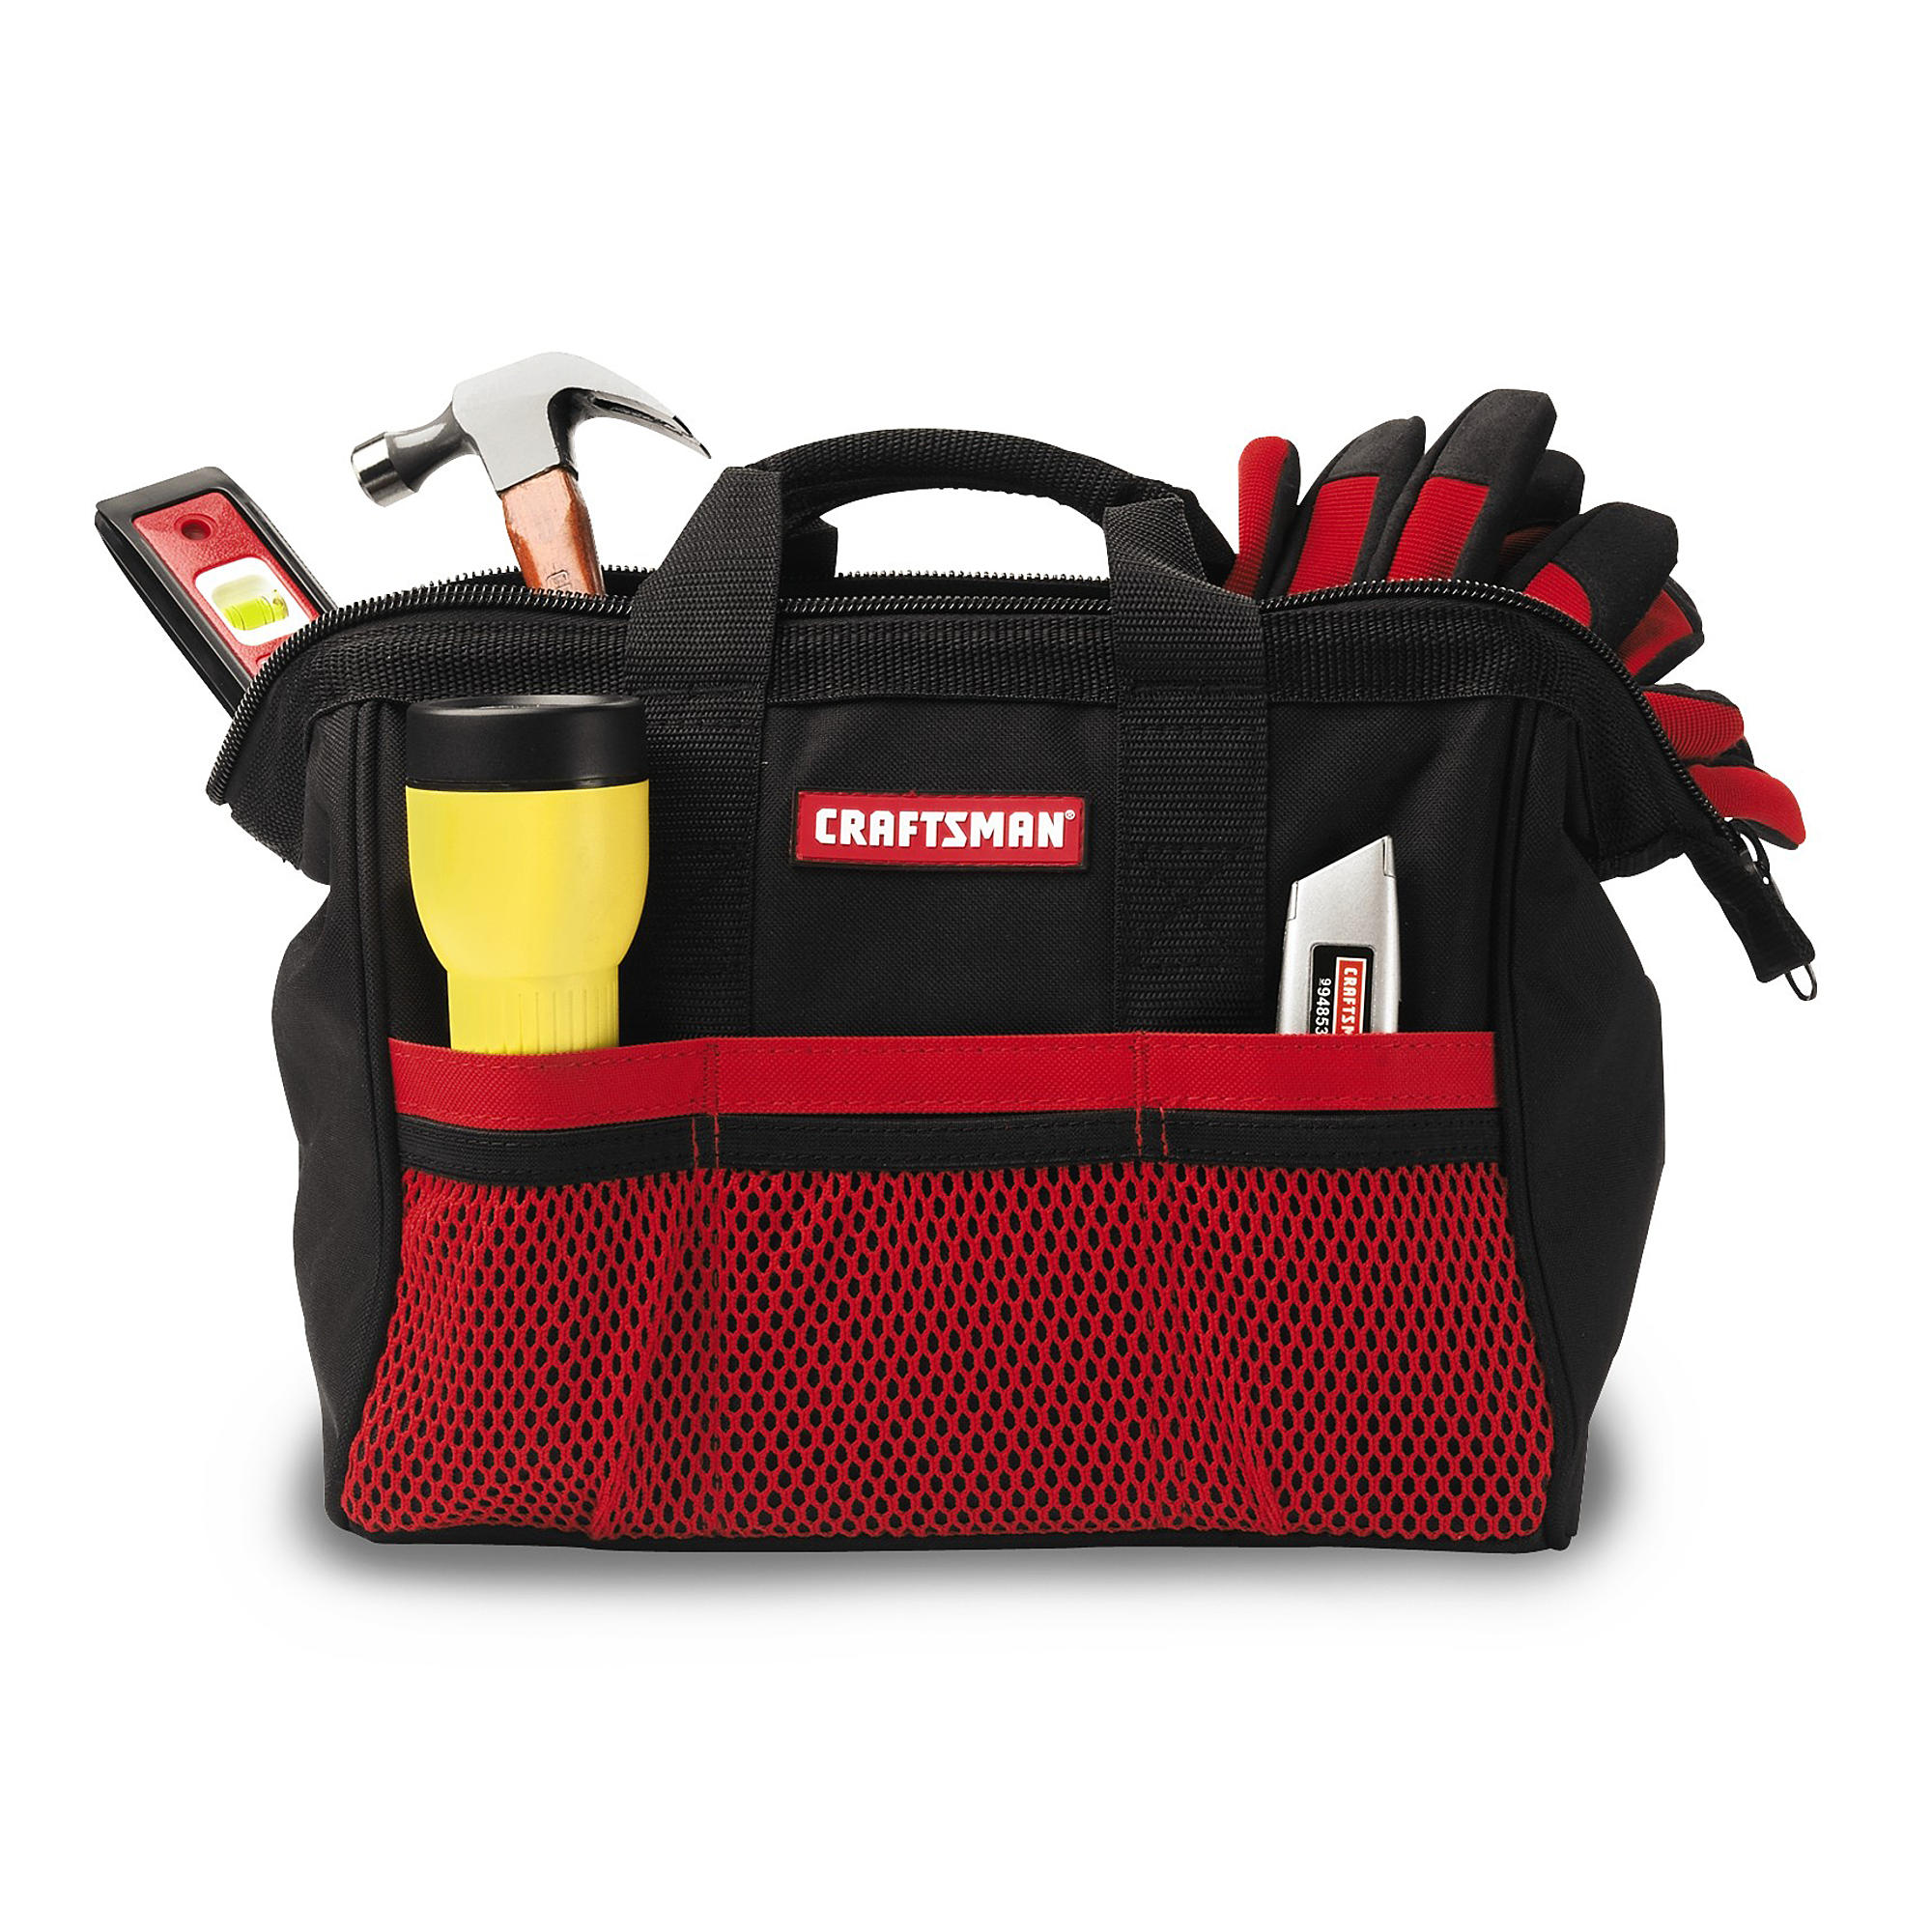 Craftsman large mouth tool bag everstart 3a smart charger